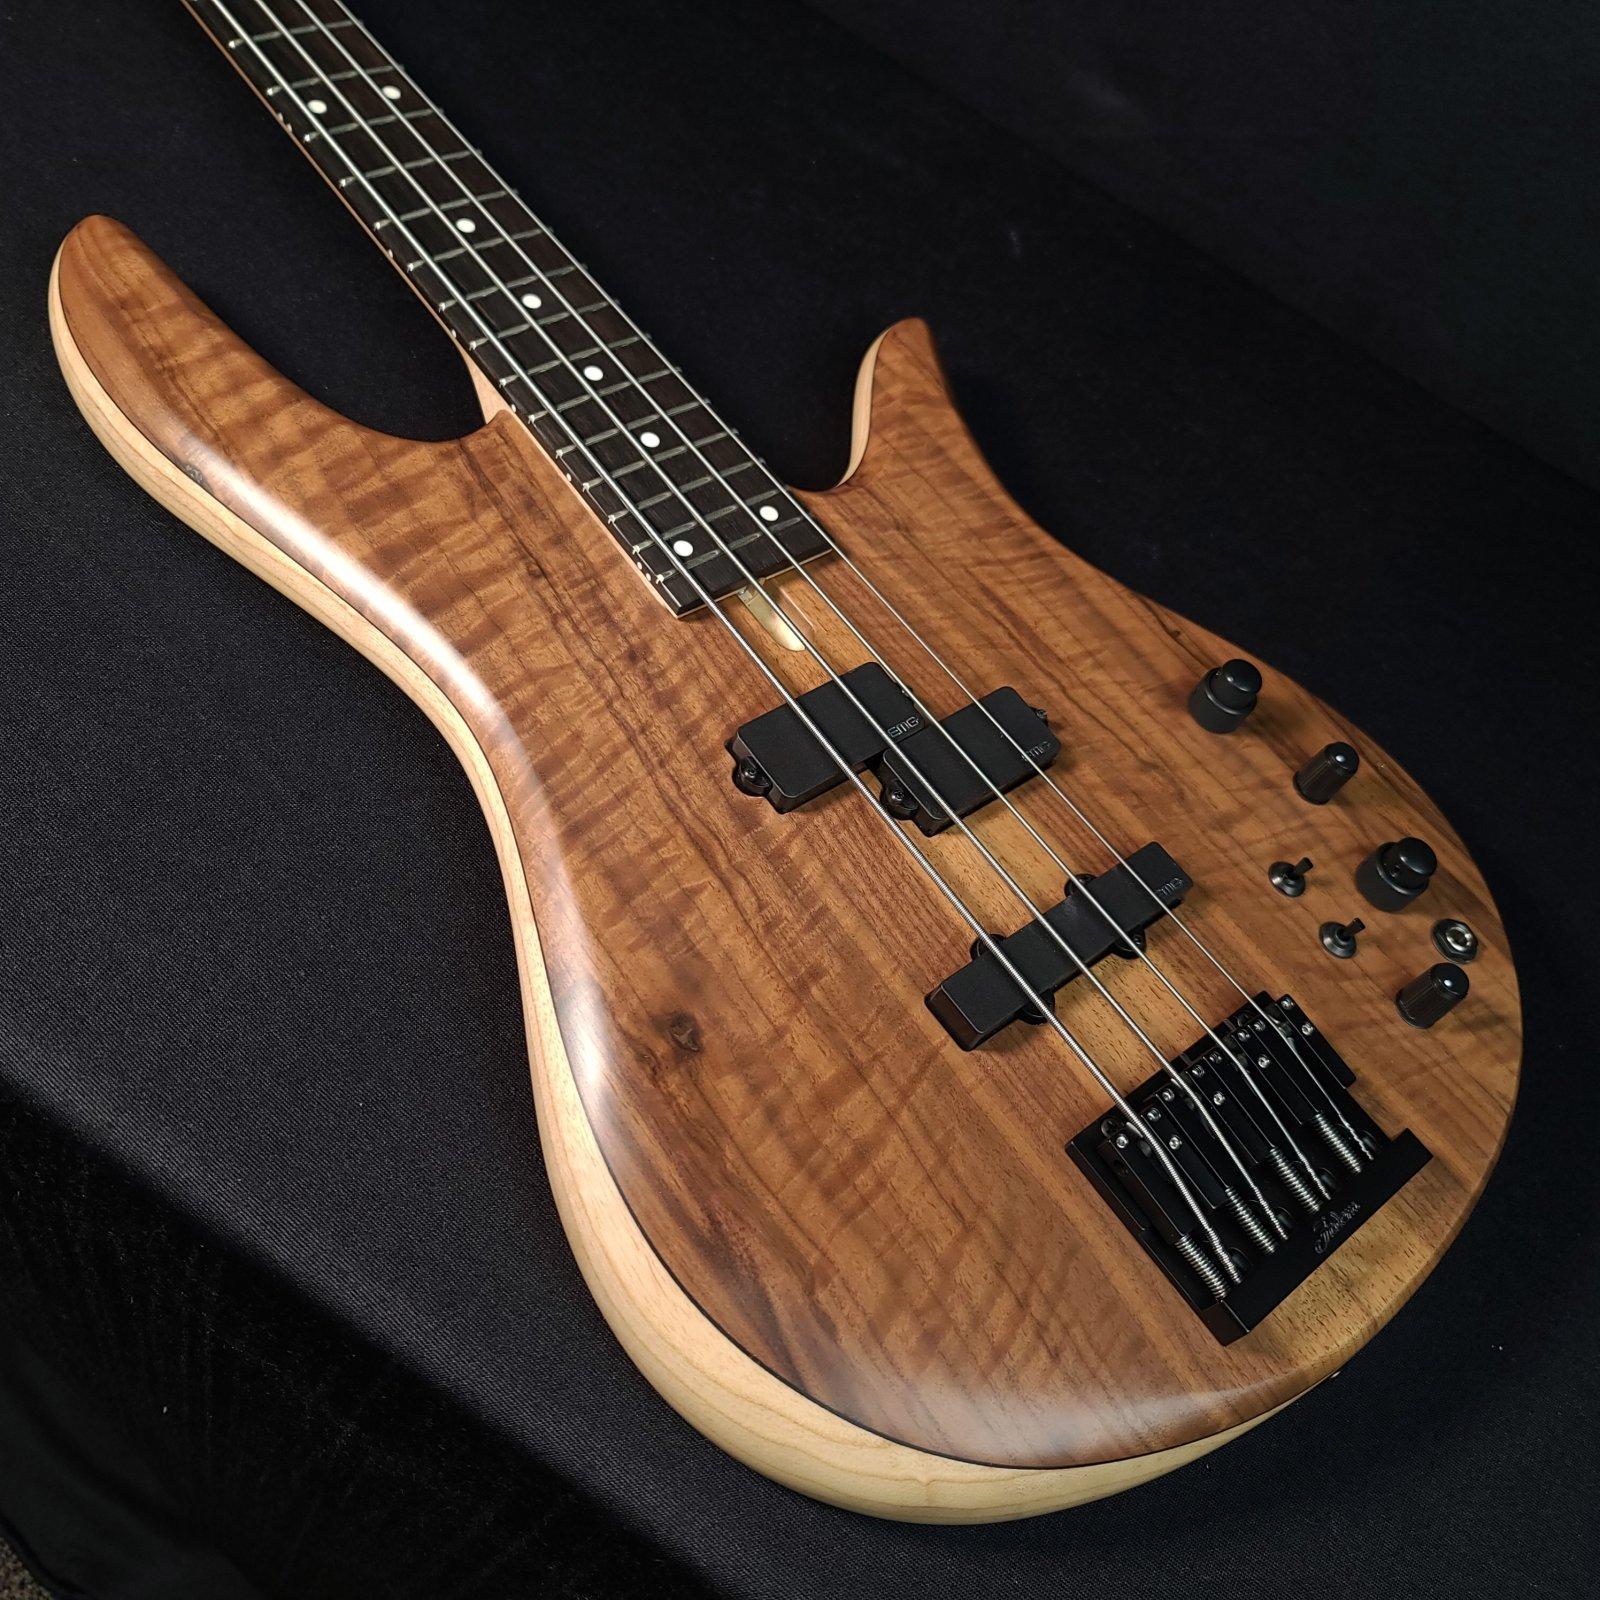 Fodera Monarch 4 Standard Special Figured Walnut, Chambered Ash Body, 4 String Bass